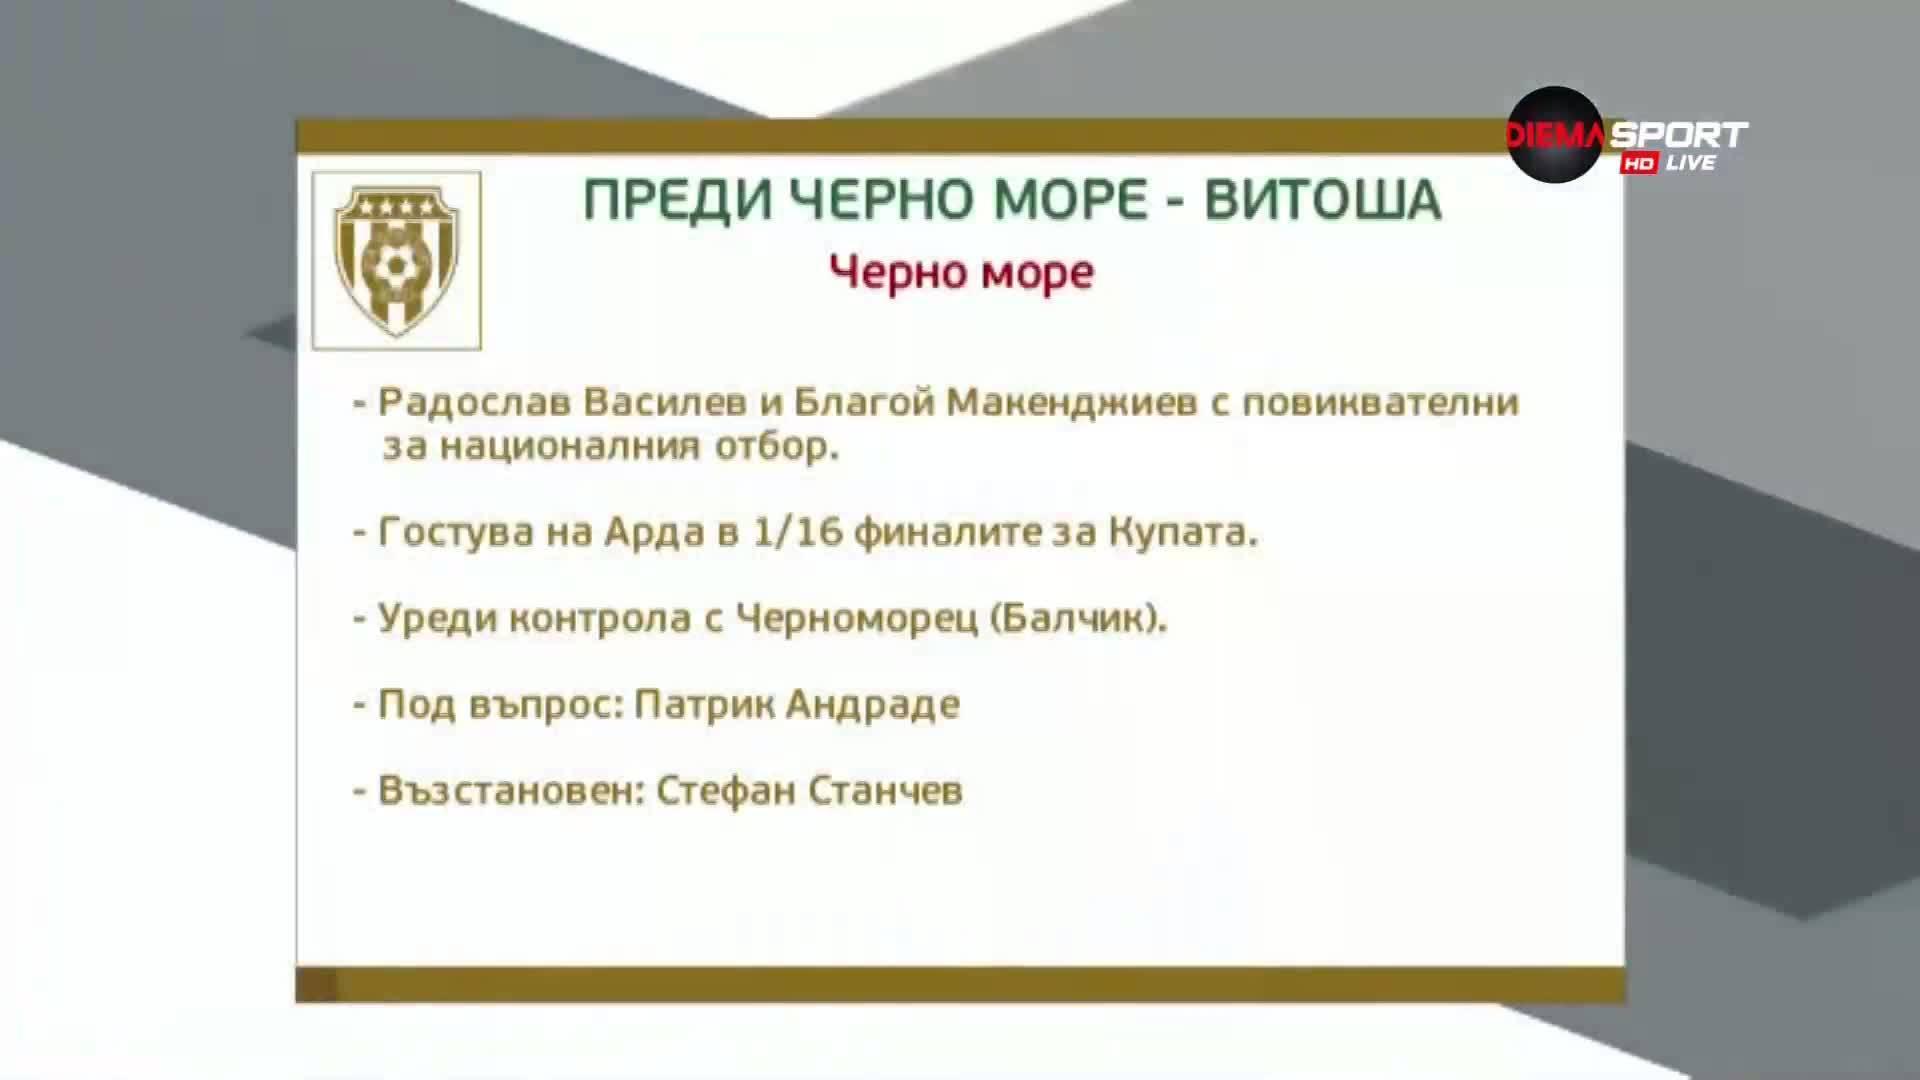 Ще залее ли Черно море Витоша?